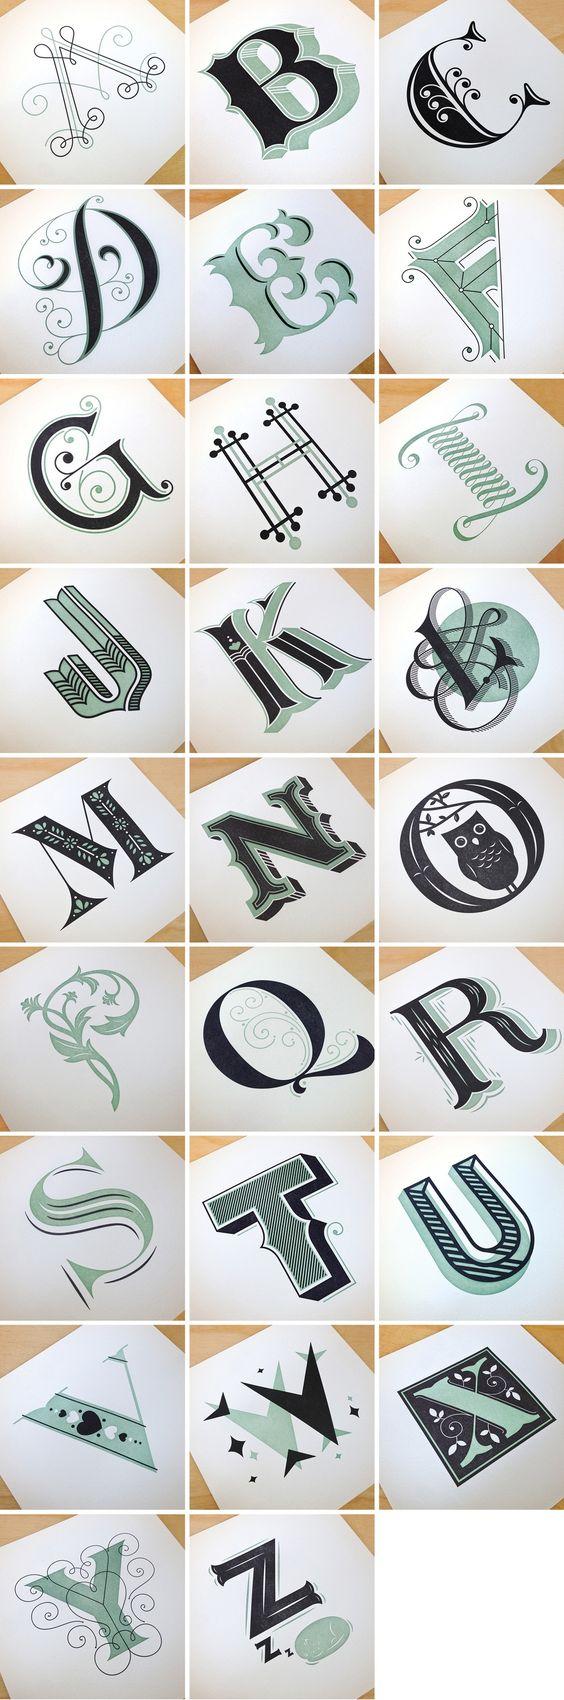 #DesignInspiration #Typography #DropCaps... Fab drop caps by Jessica Hische